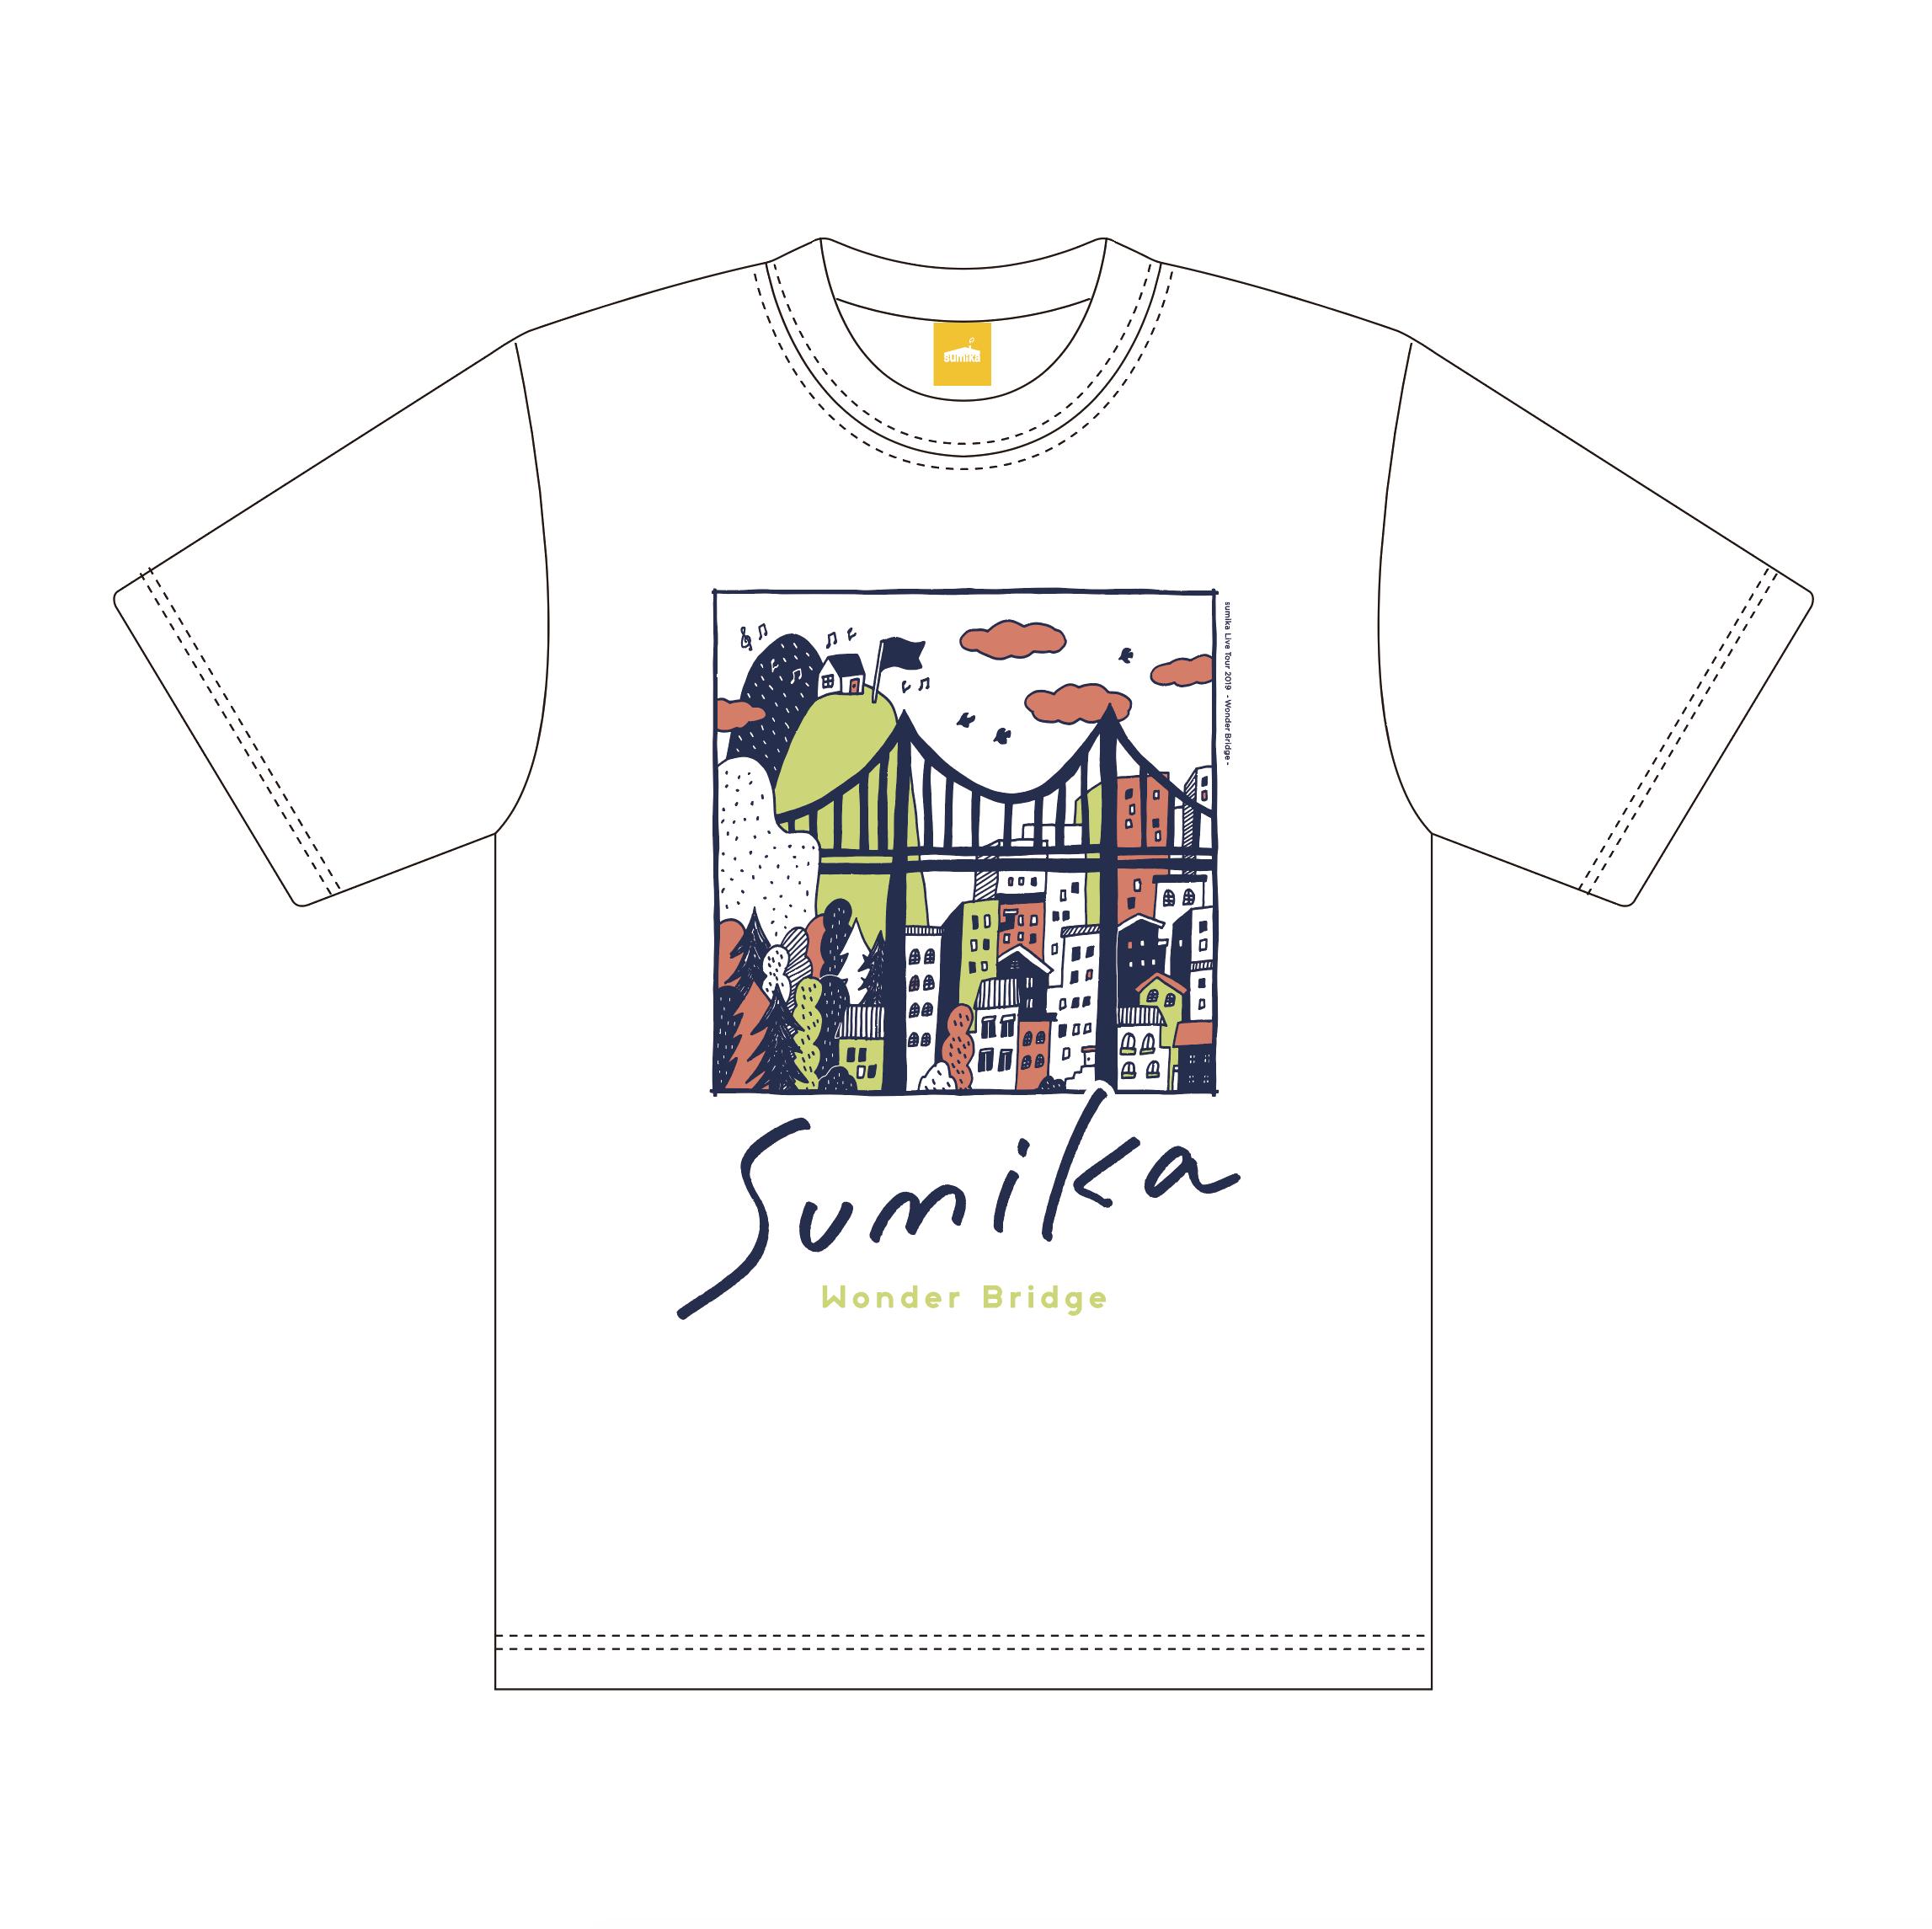 sumika / Wonder Bridge Tシャツ(ホワイト)